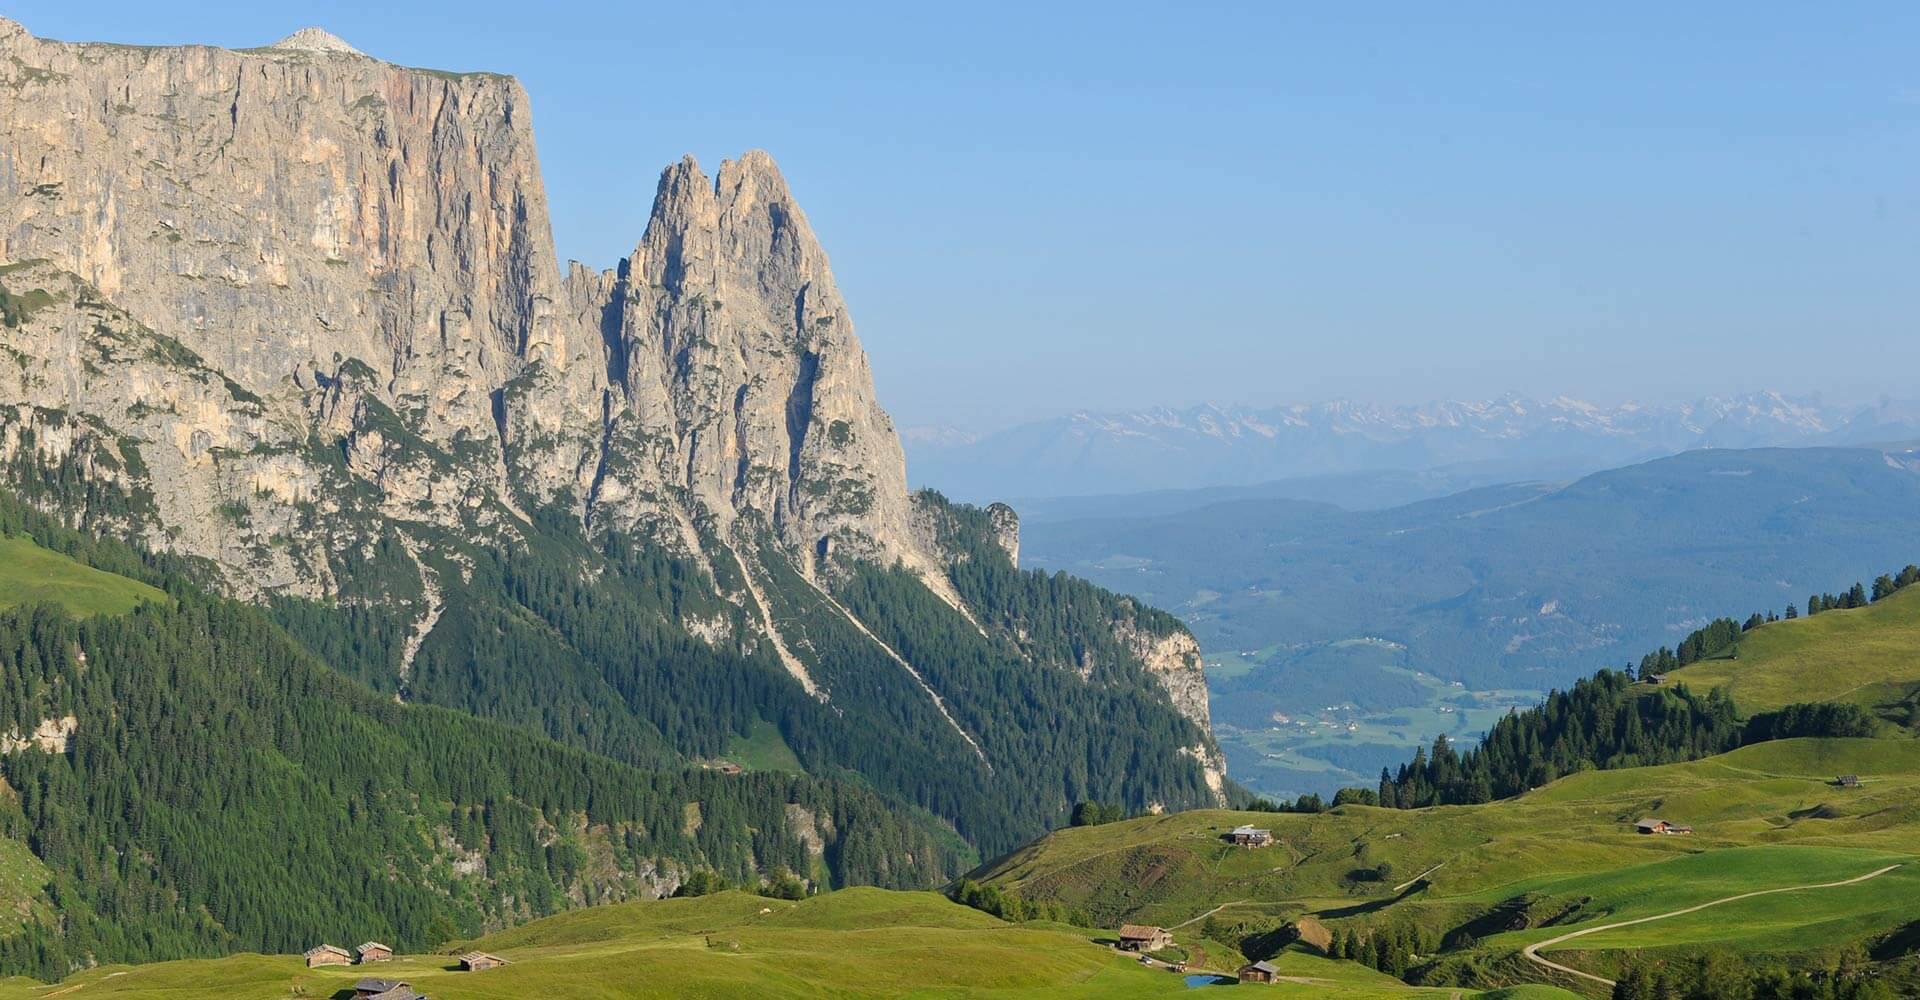 Urlaub an der Seiser Alm - UNESCO-Weltnaturerbe Dolomiten